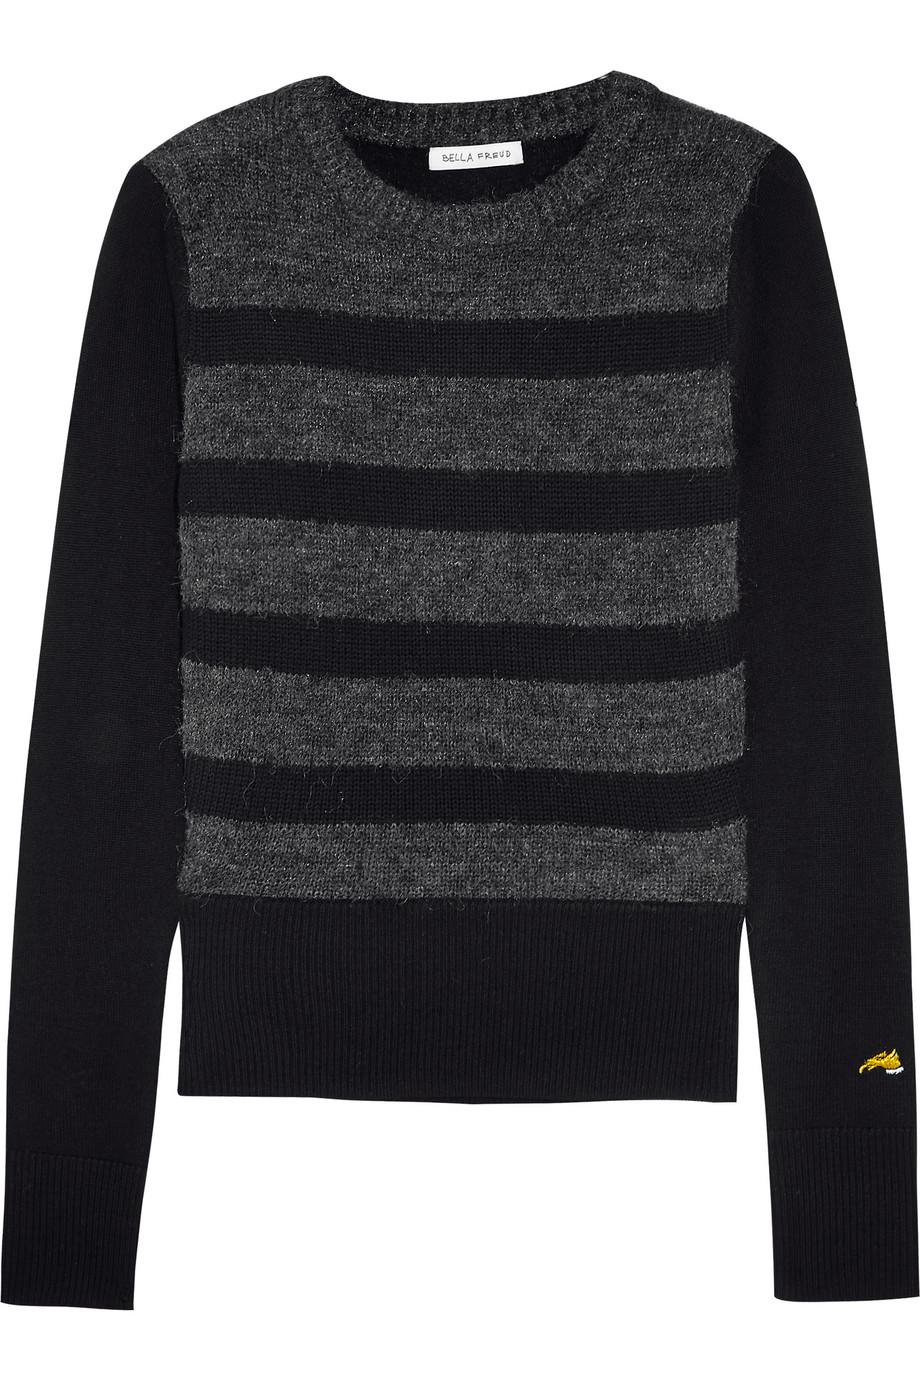 Bella Freud Glam Rock Striped Wool-Bend Sweater, Size: XS